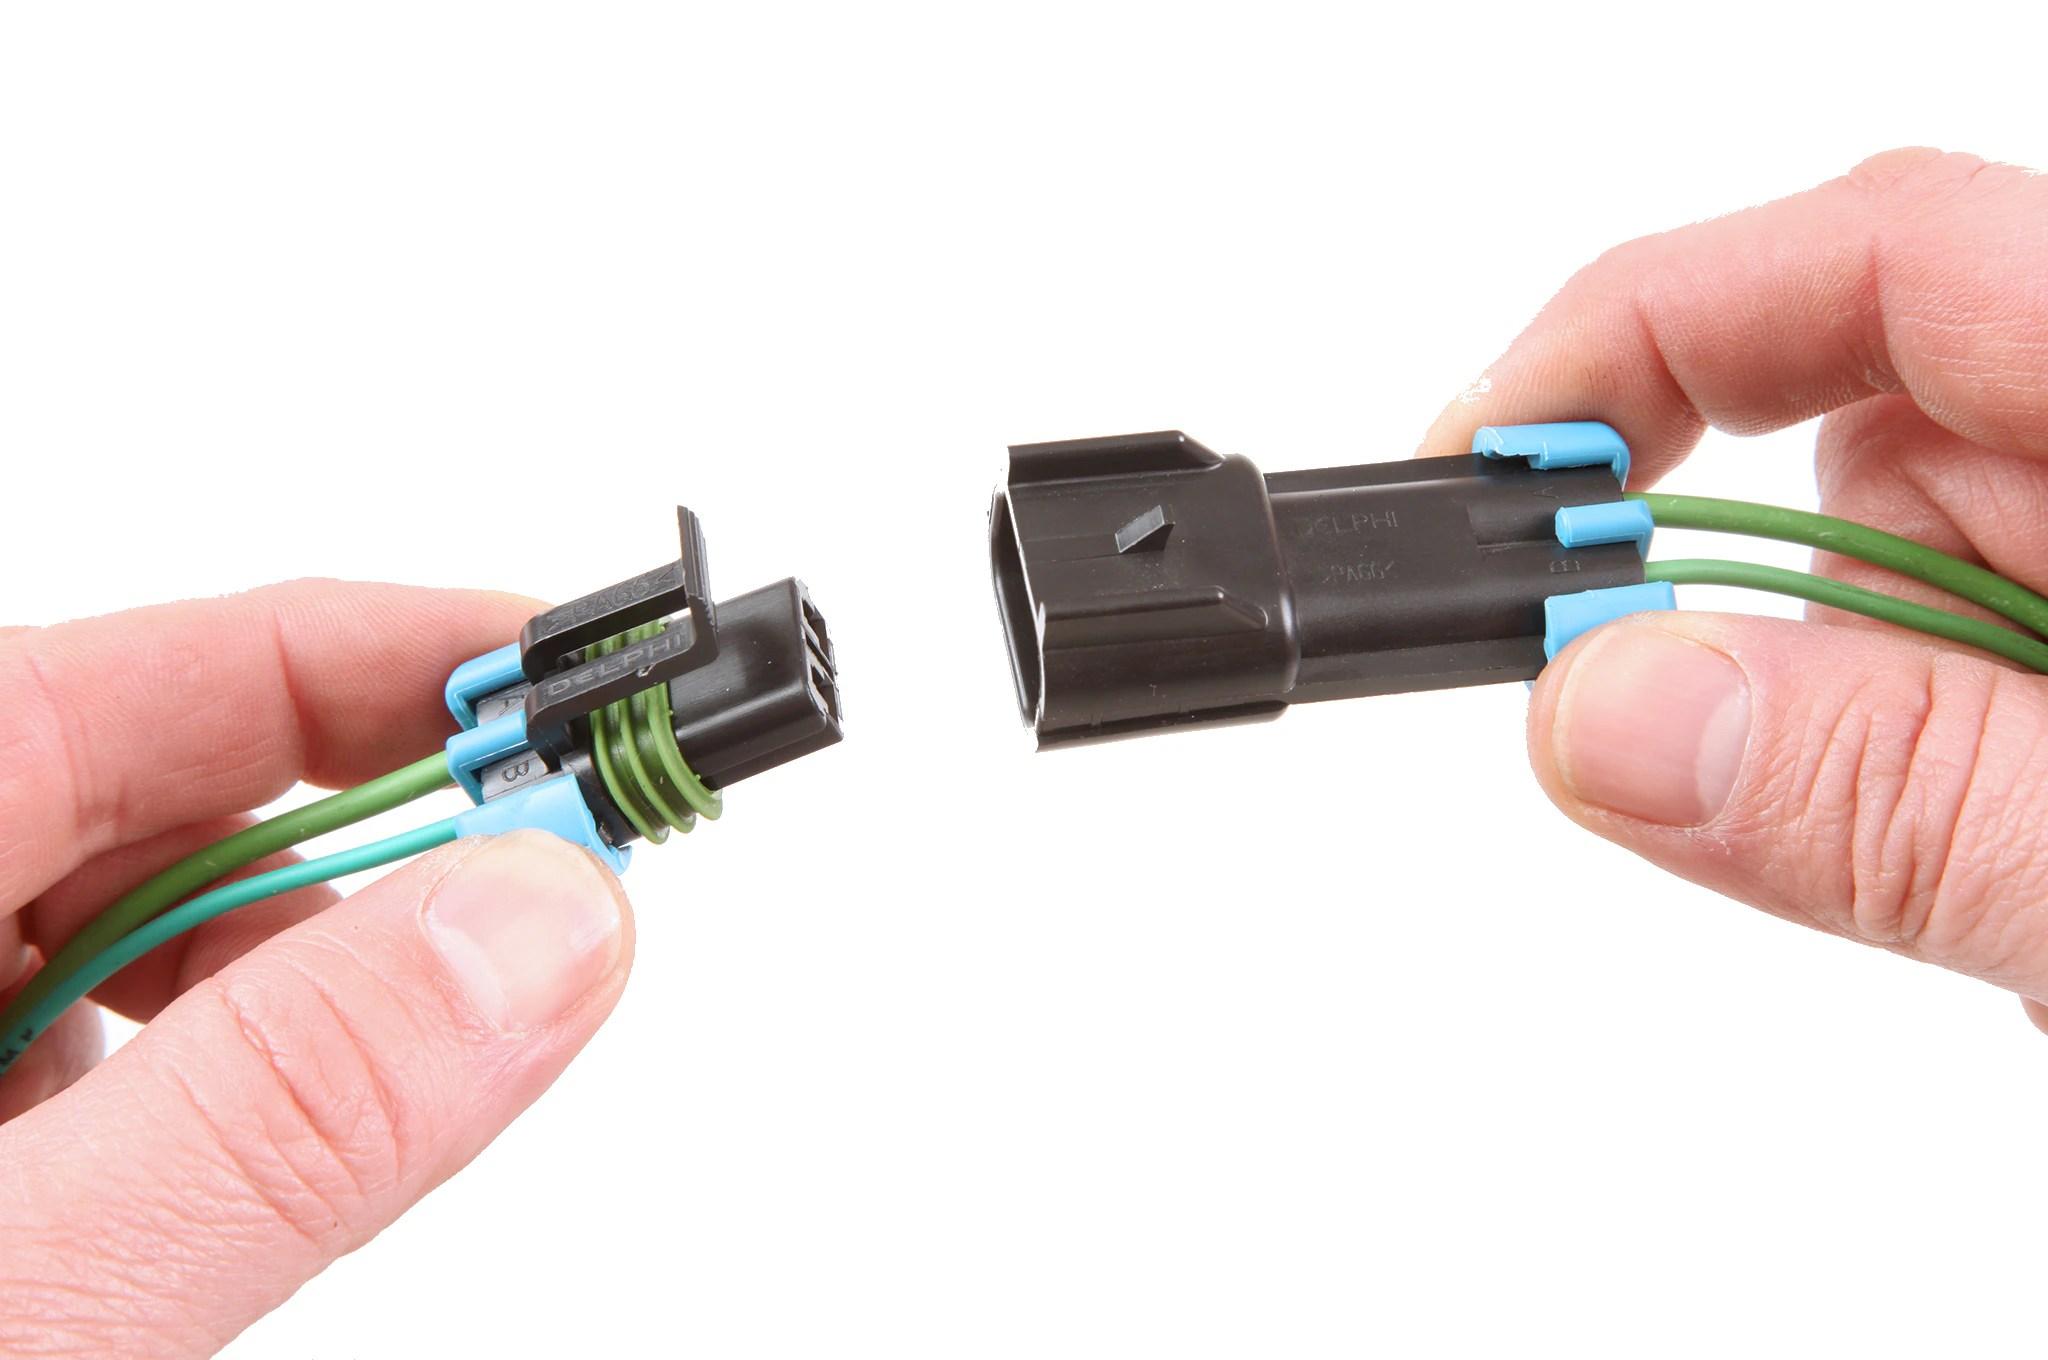 gm wiring harness connector locking wiring diagrams fjgm wiring harness connector locking everything wiring diagram gm [ 2048 x 1360 Pixel ]